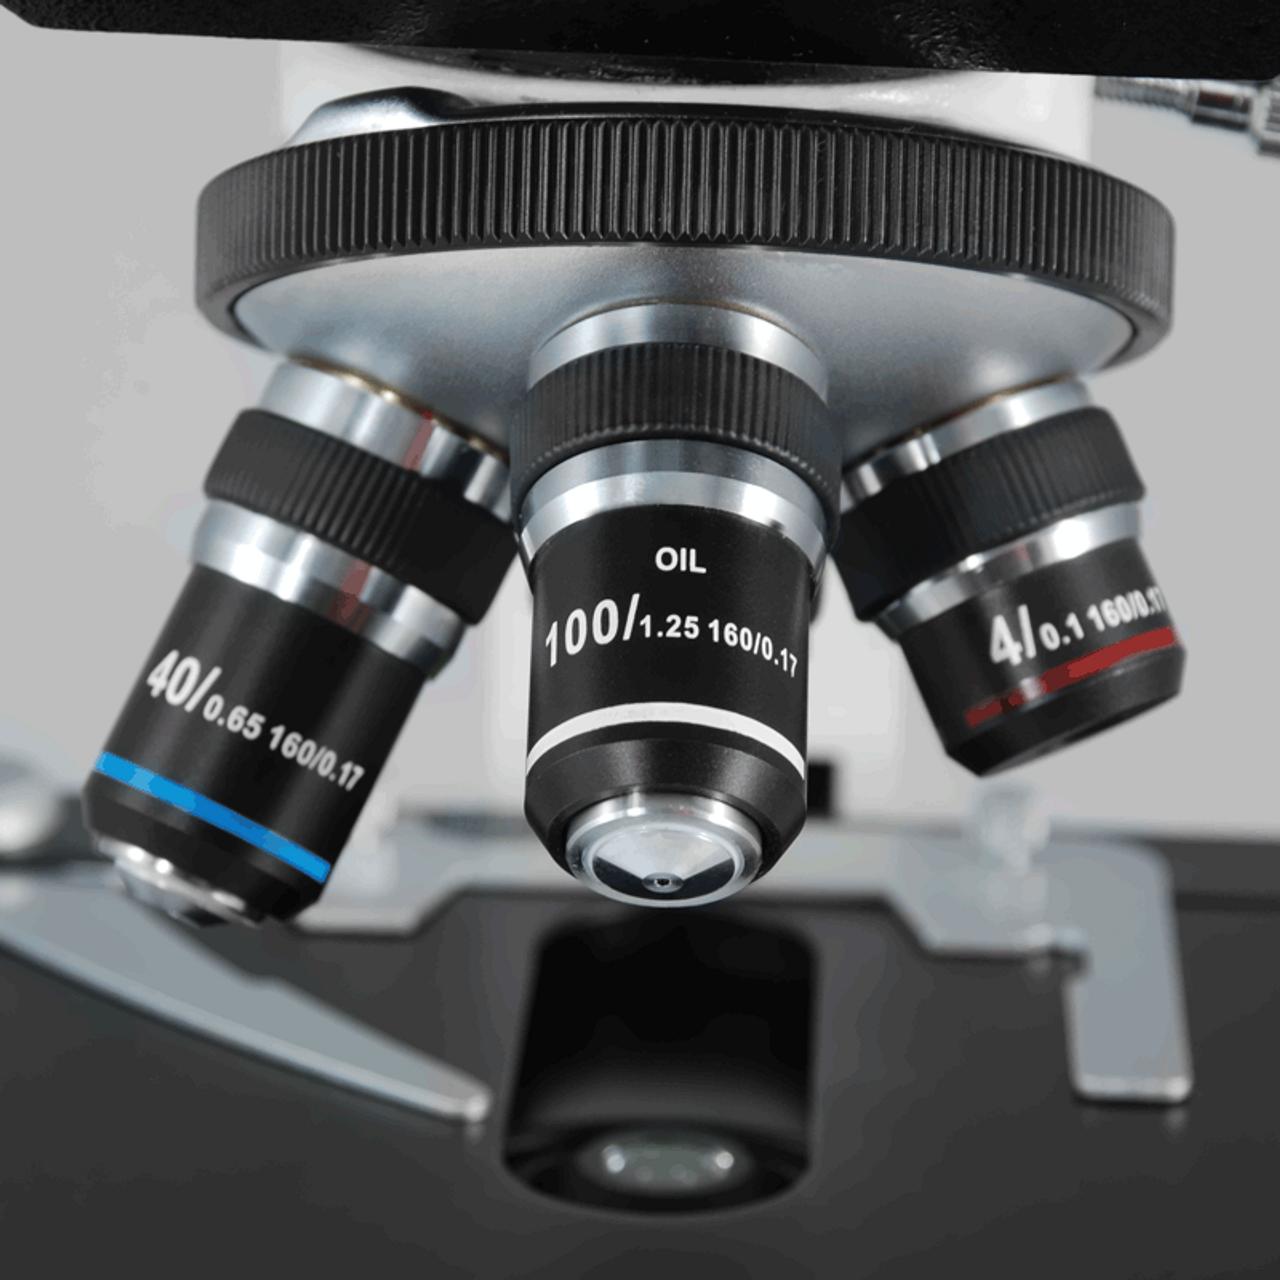 BoliOptics 100X Plan Achromatic Metallurgical Microscope Objective Lens Working Distance 0.33mm MT14023831